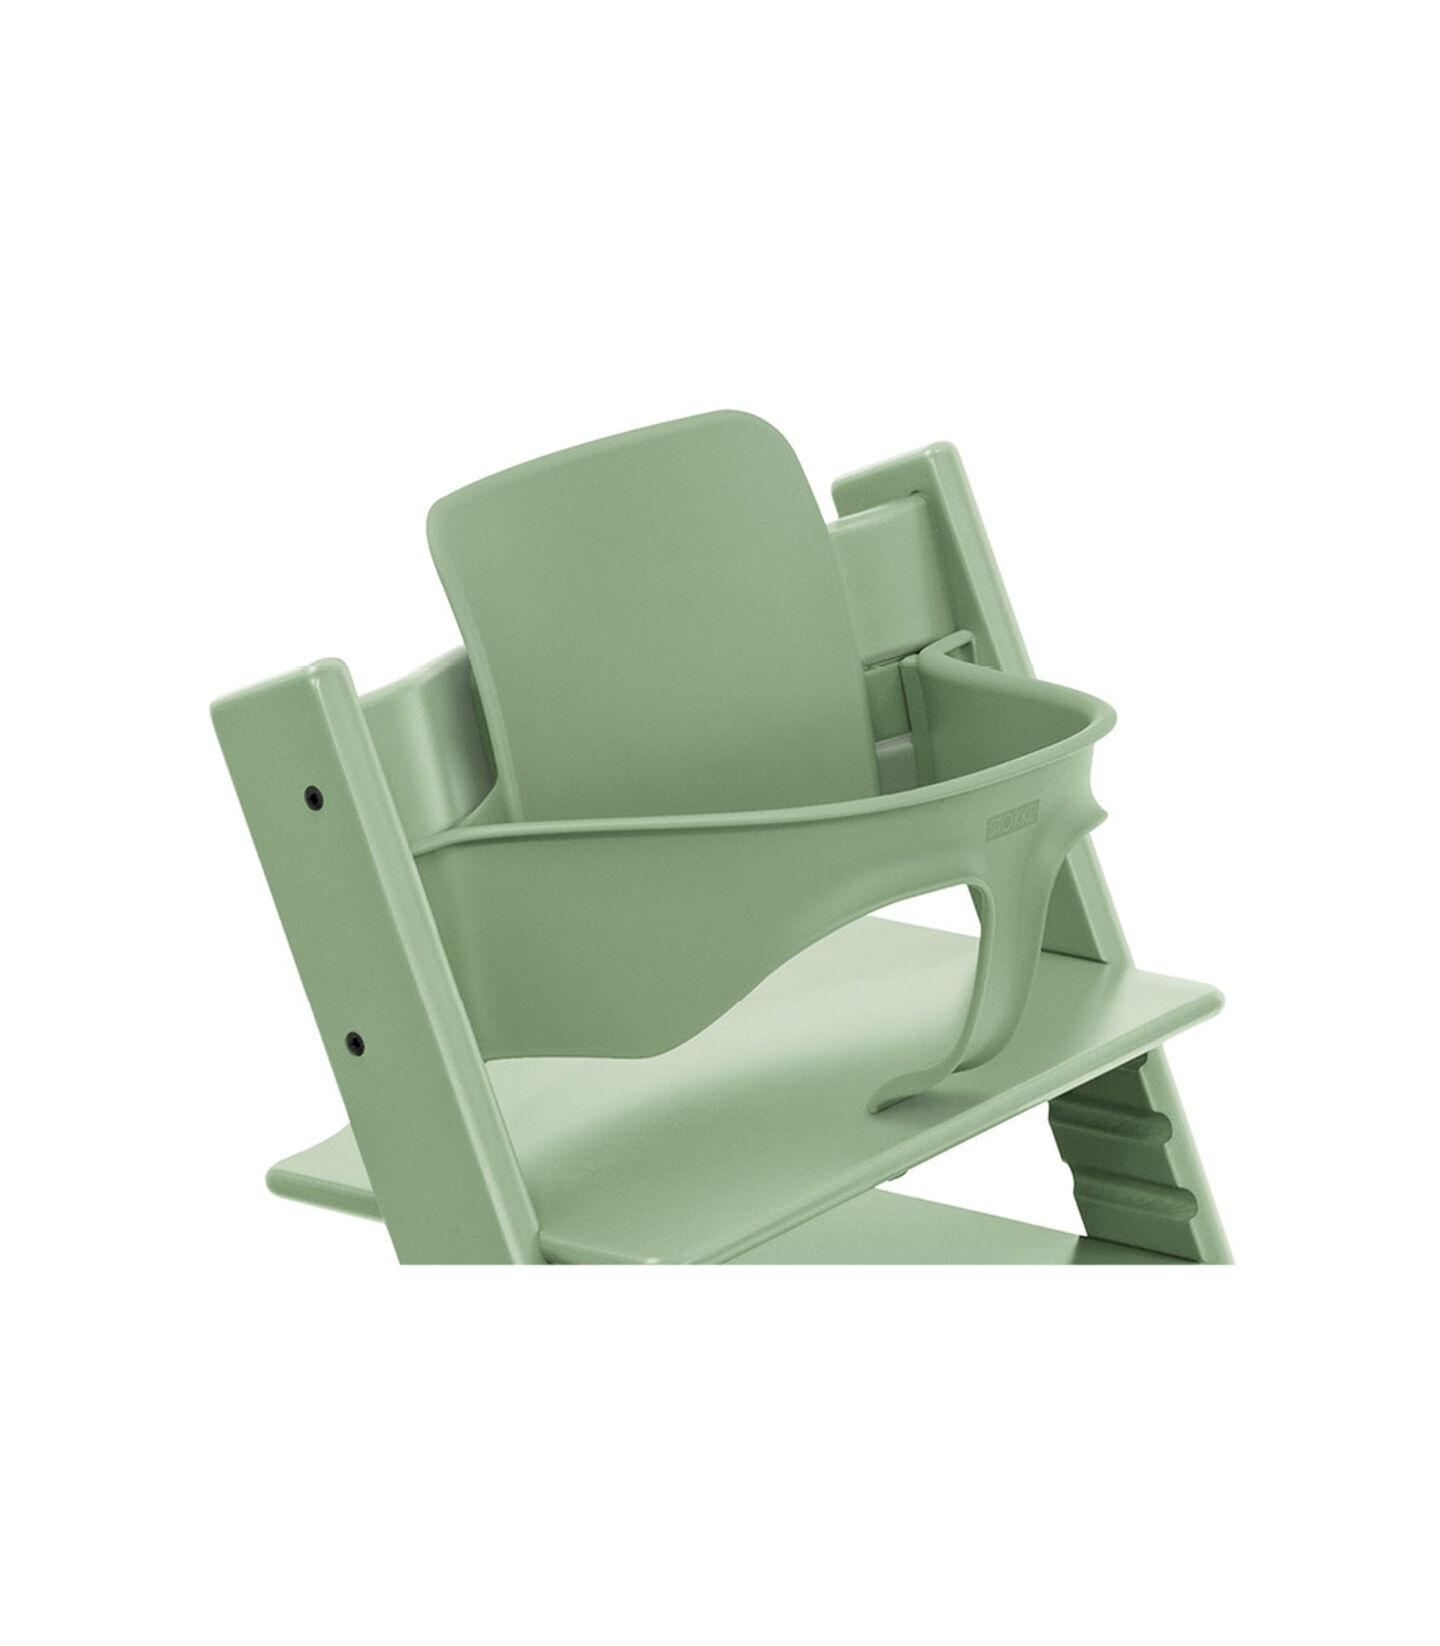 Tripp Trapp® Baby Set Verde Musgo, Verde Musgo, mainview view 1